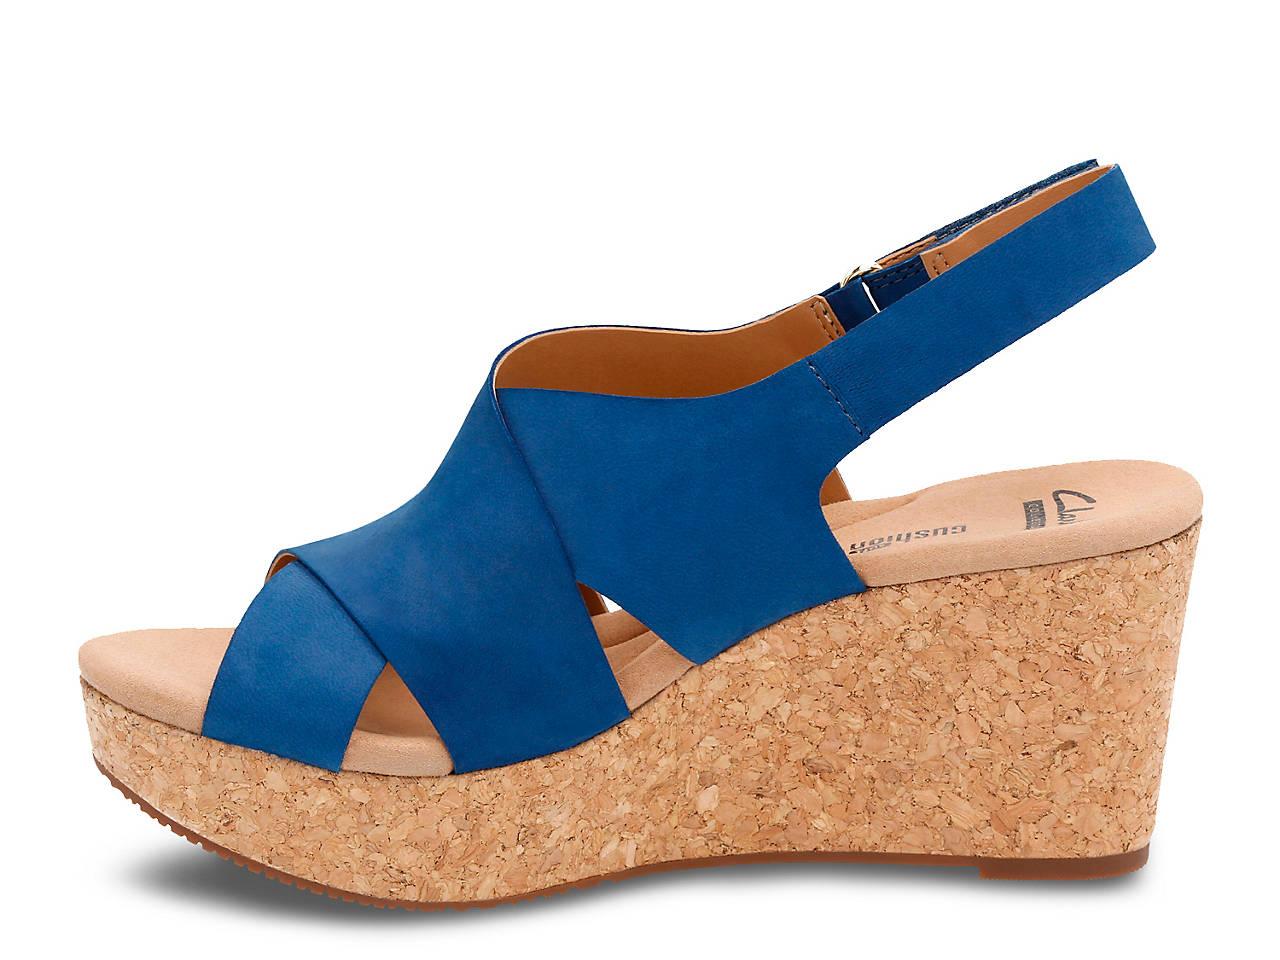 fb6b5ed2d6d Clarks Annadel Fareda Sandal Women s Shoes